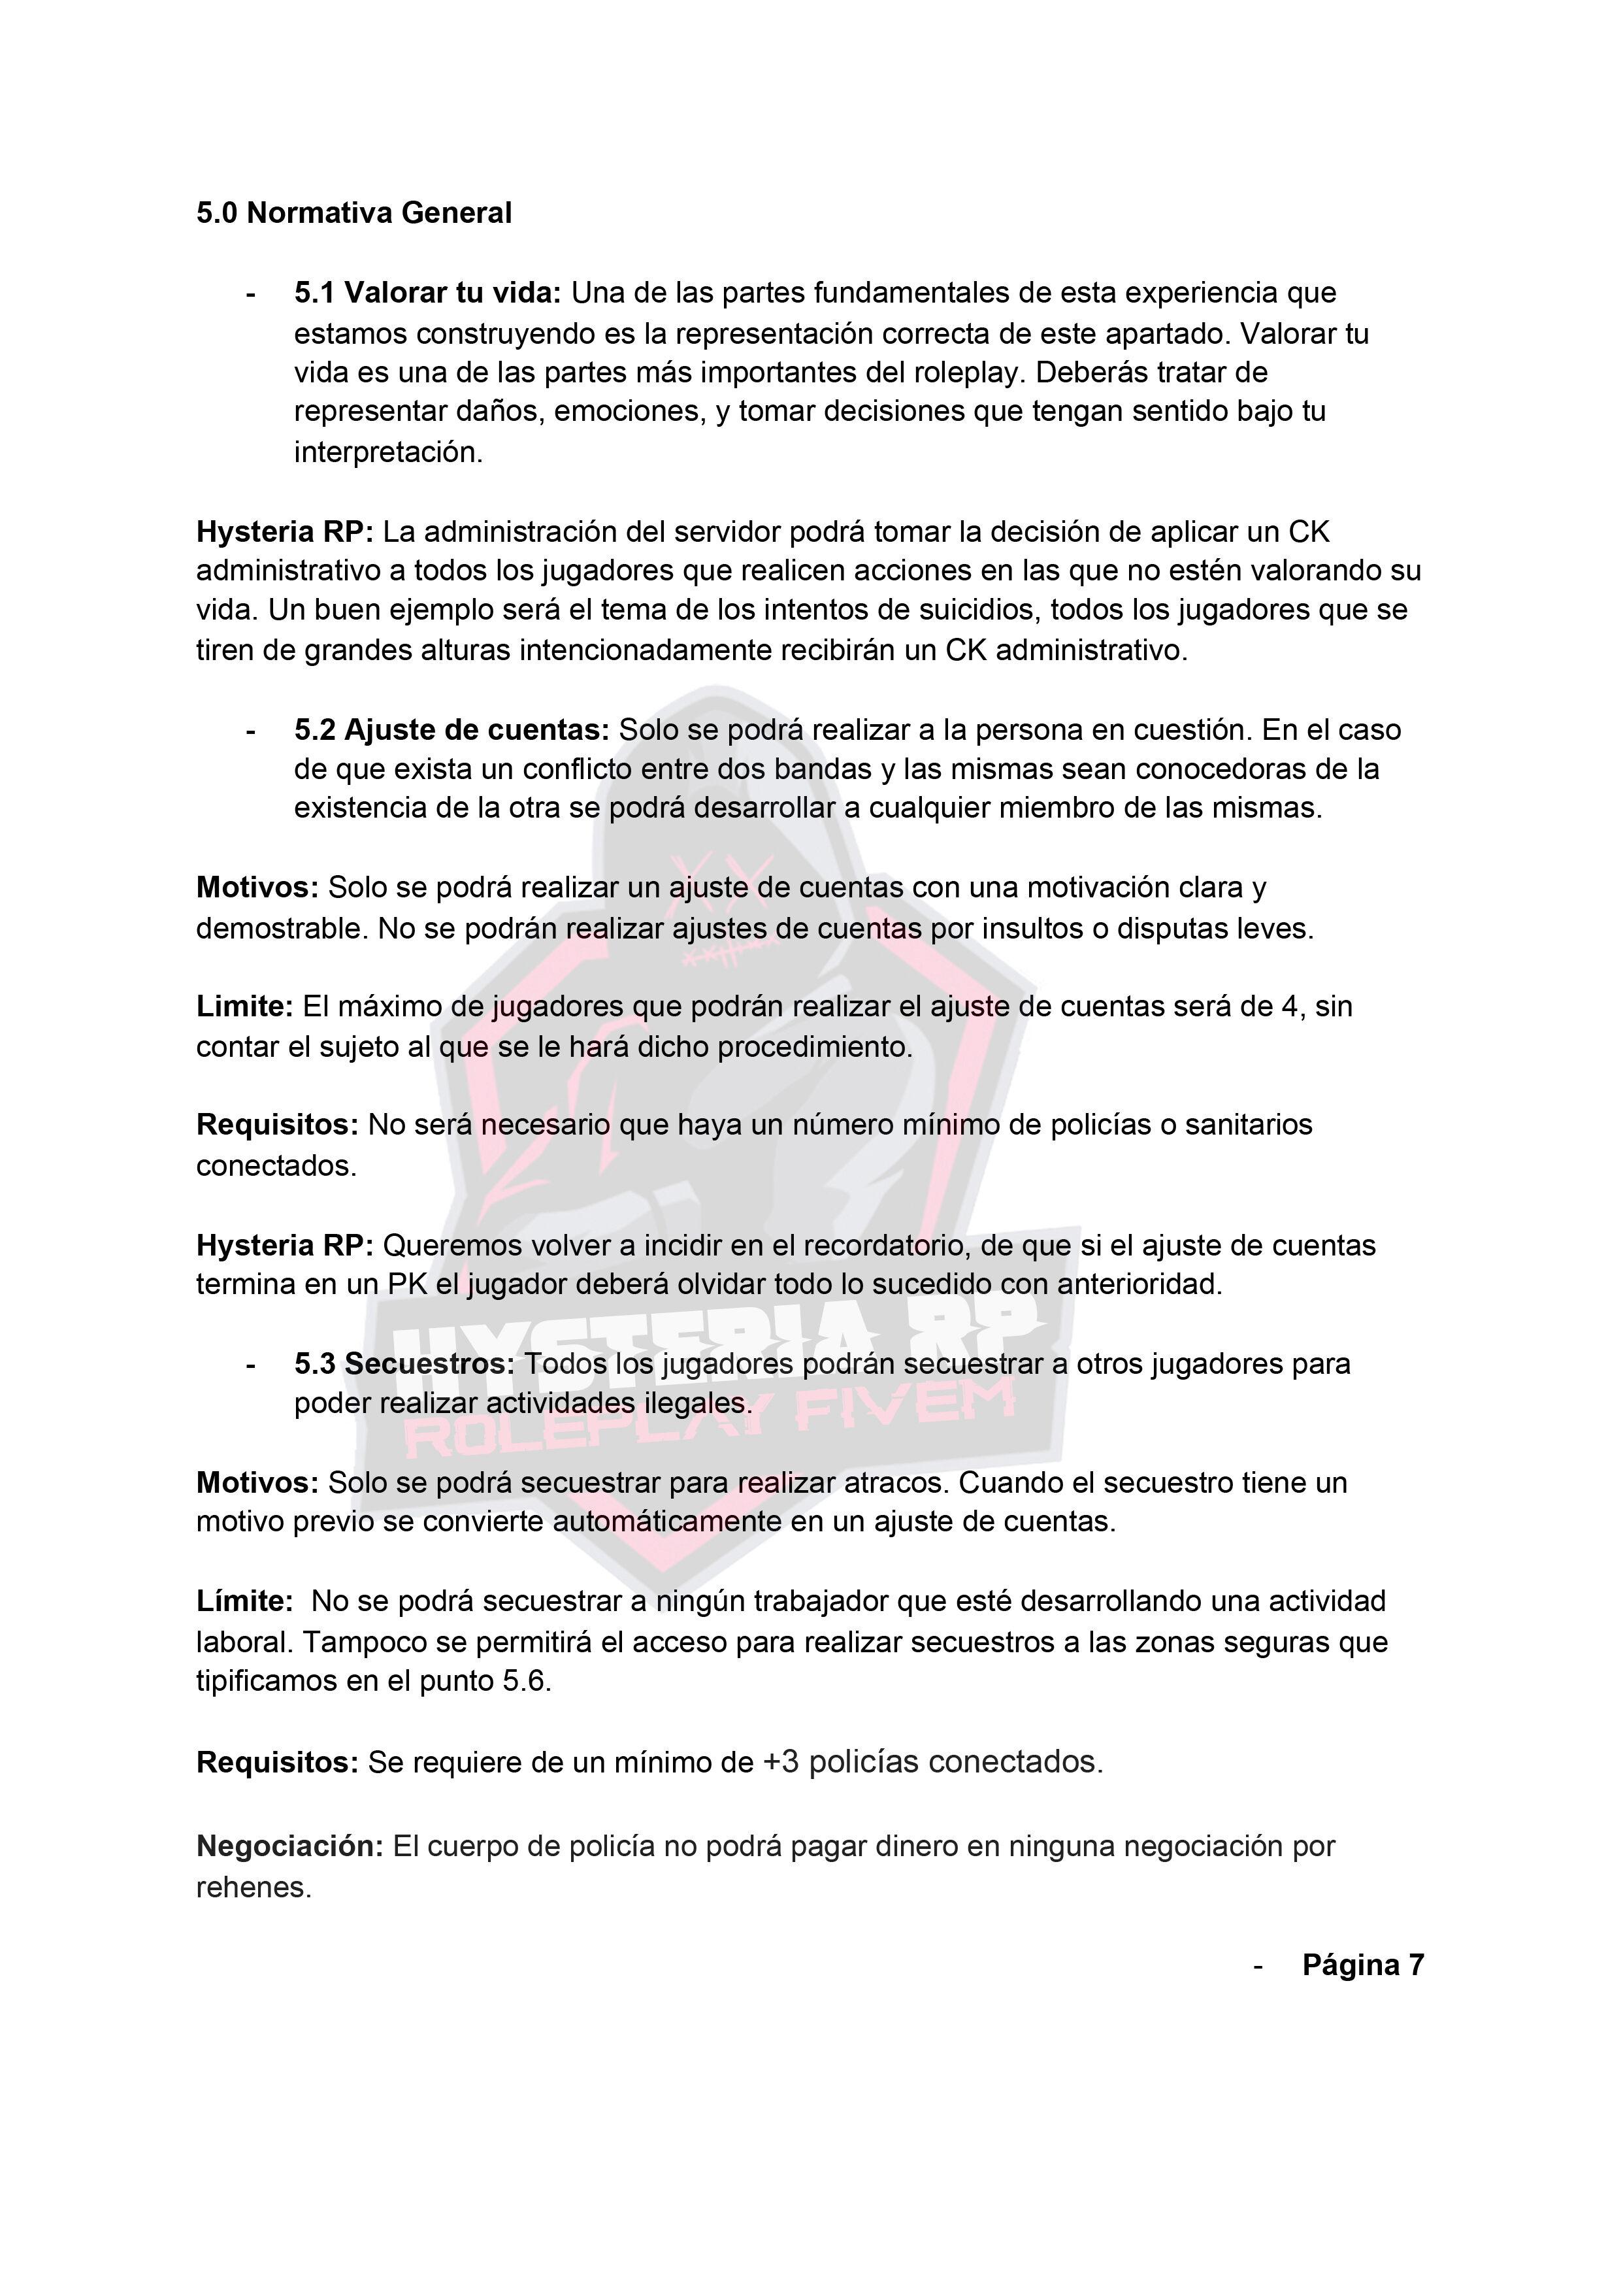 Normativa General | Hysteria RP Normat19